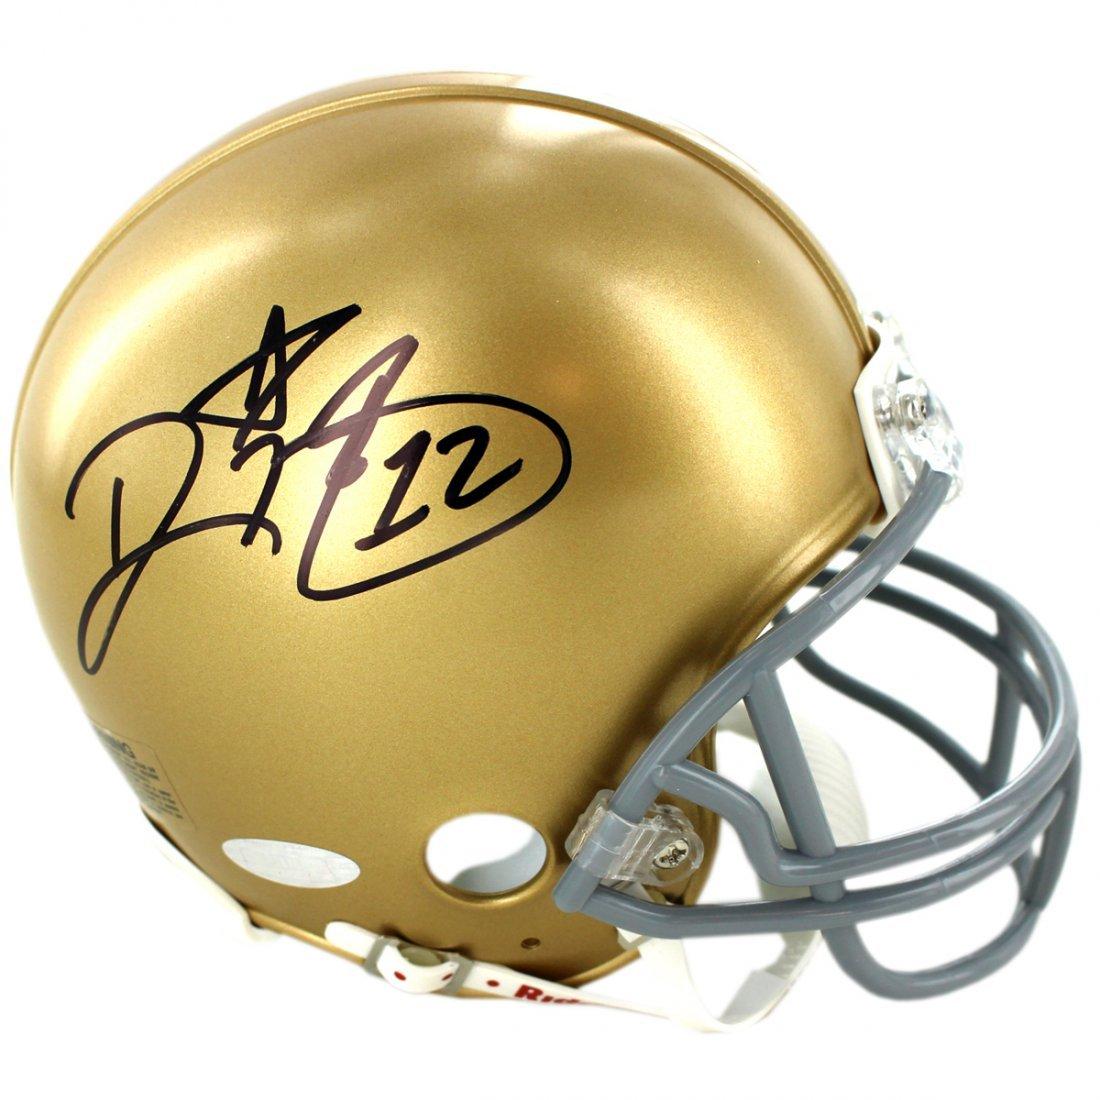 Ricky Watters Signed Notre Dame Mini Helmet